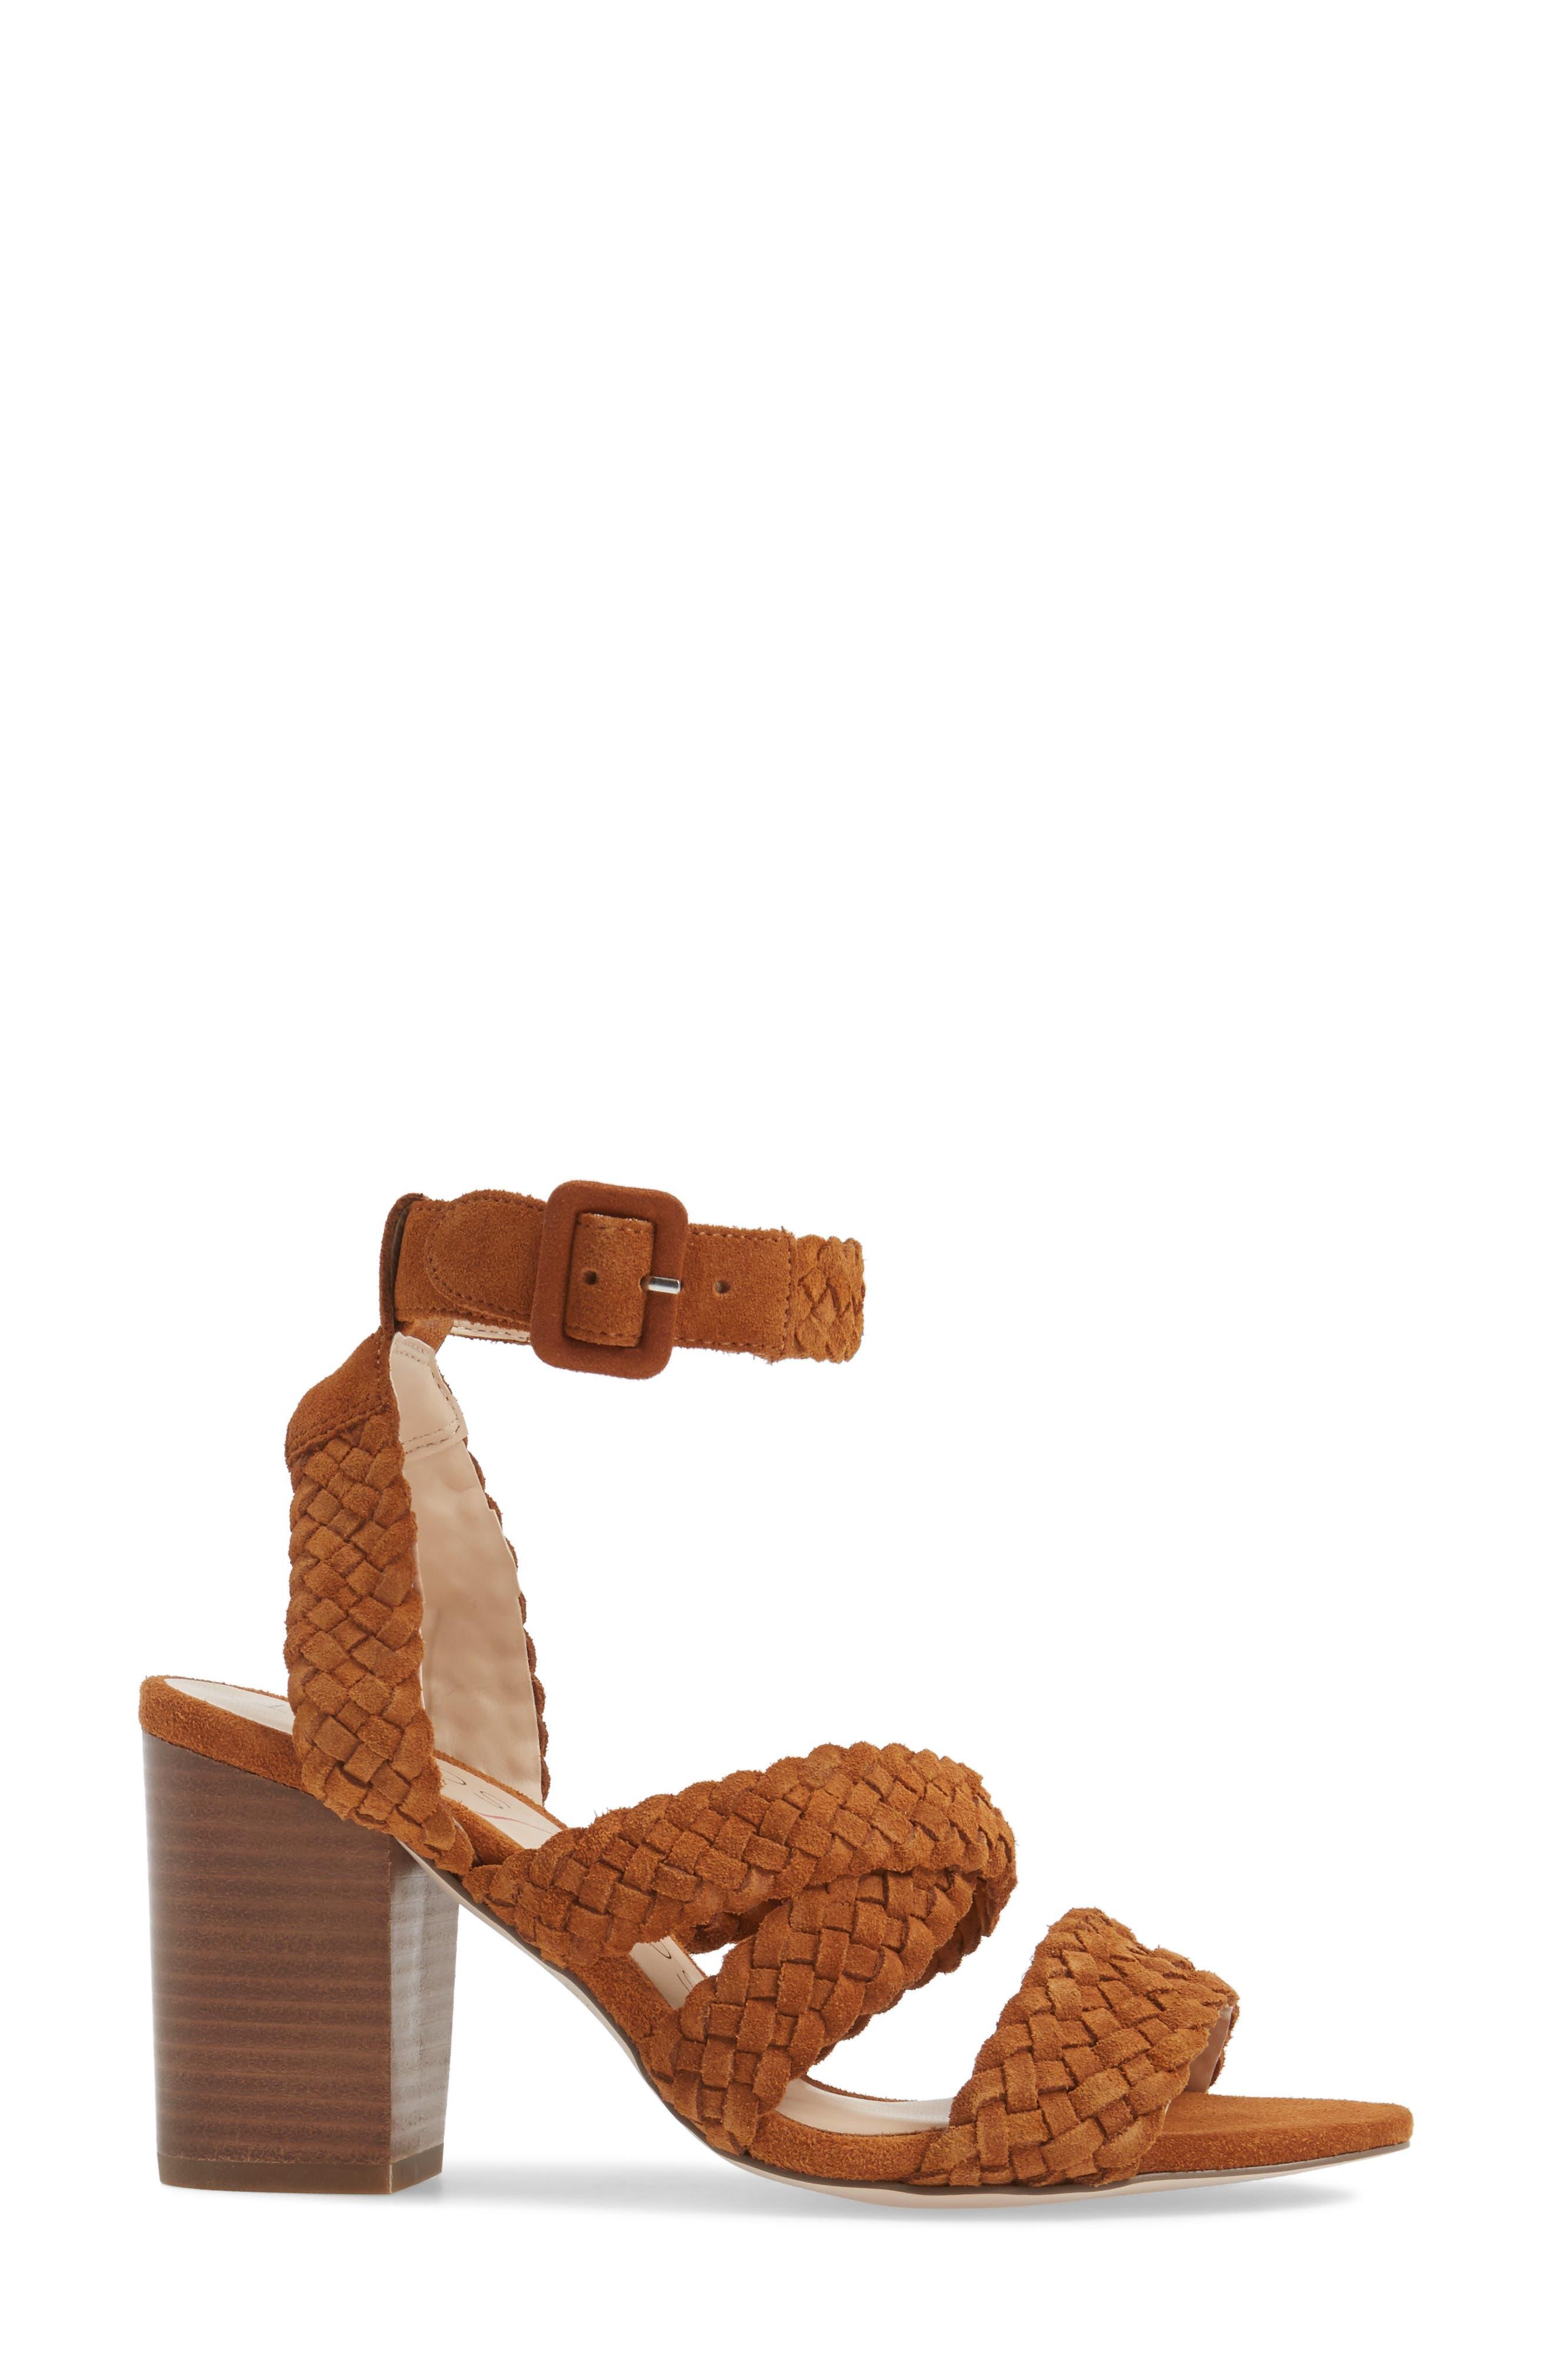 SOLE SOCIETY,                             Evelina Block Heel Sandal,                             Alternate thumbnail 3, color,                             240